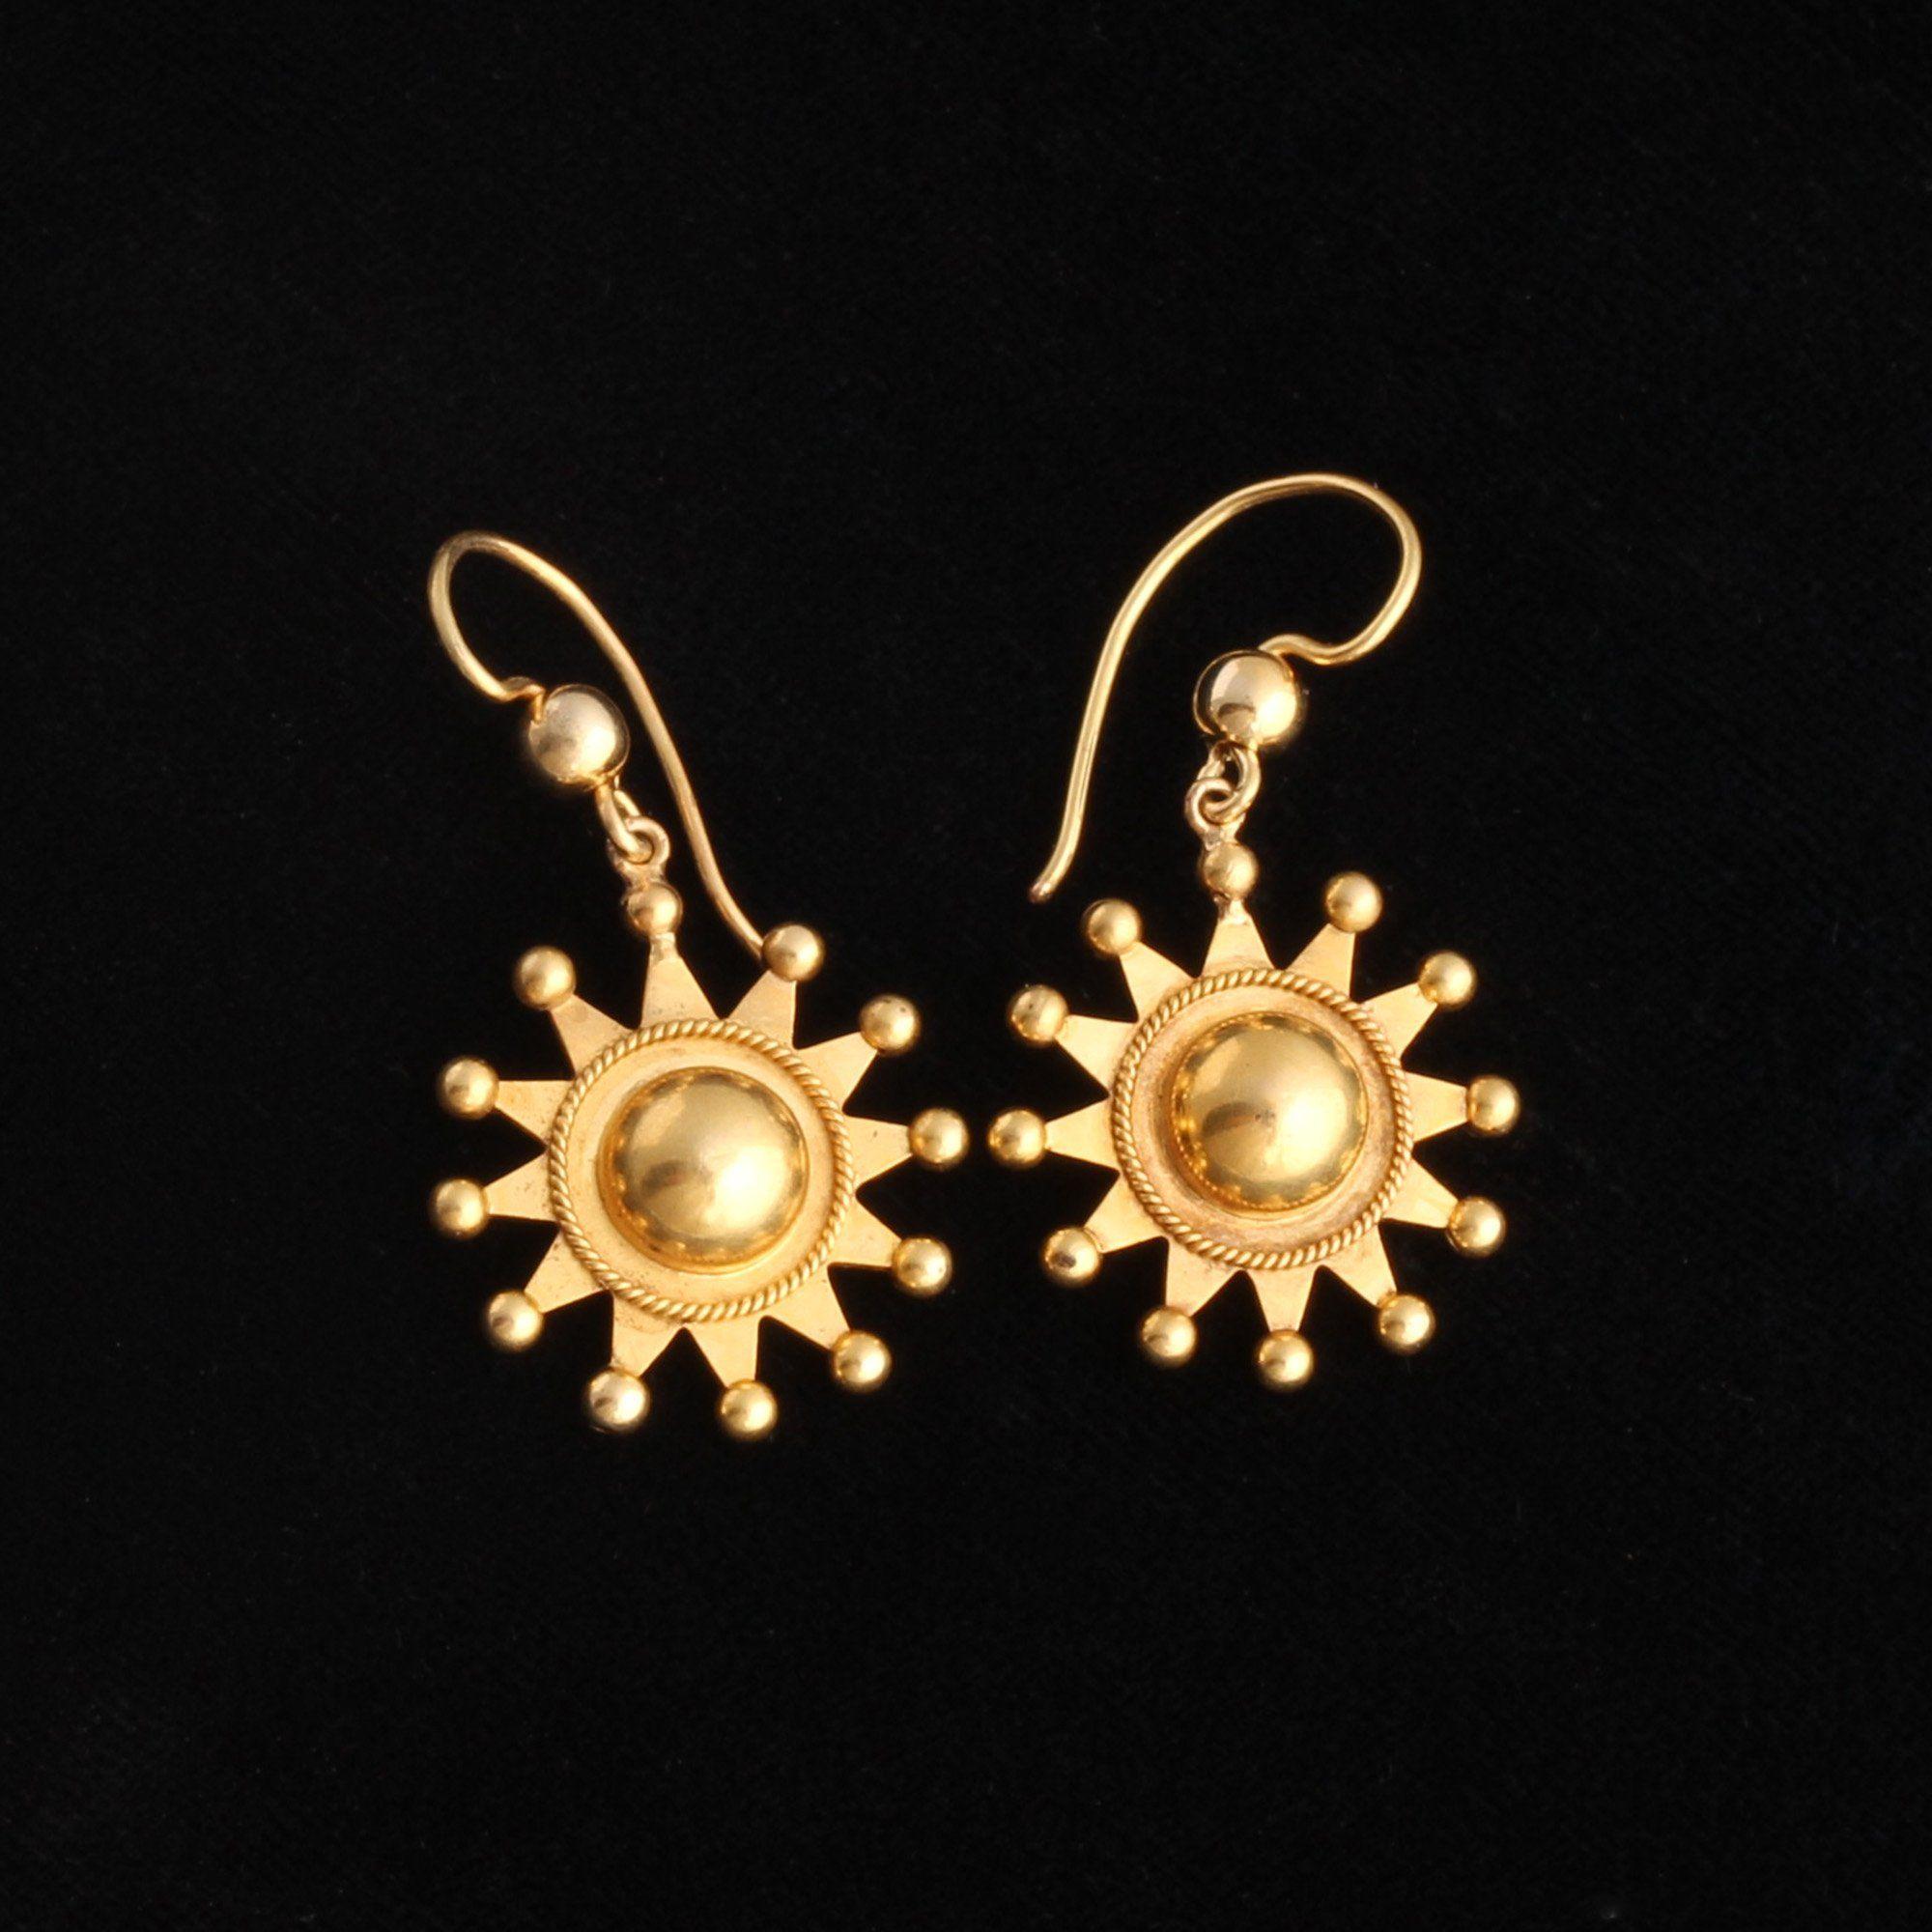 Victorian Sunburst Earrings